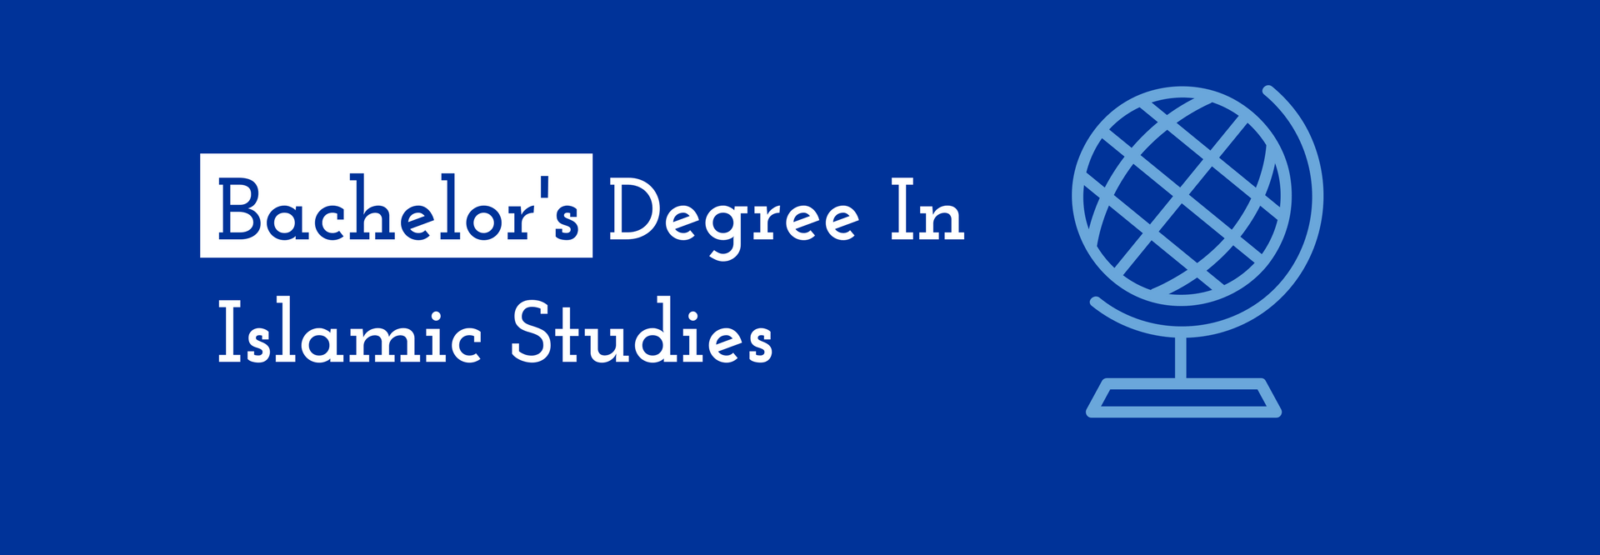 Bachelor's Degree In Islamic Studies